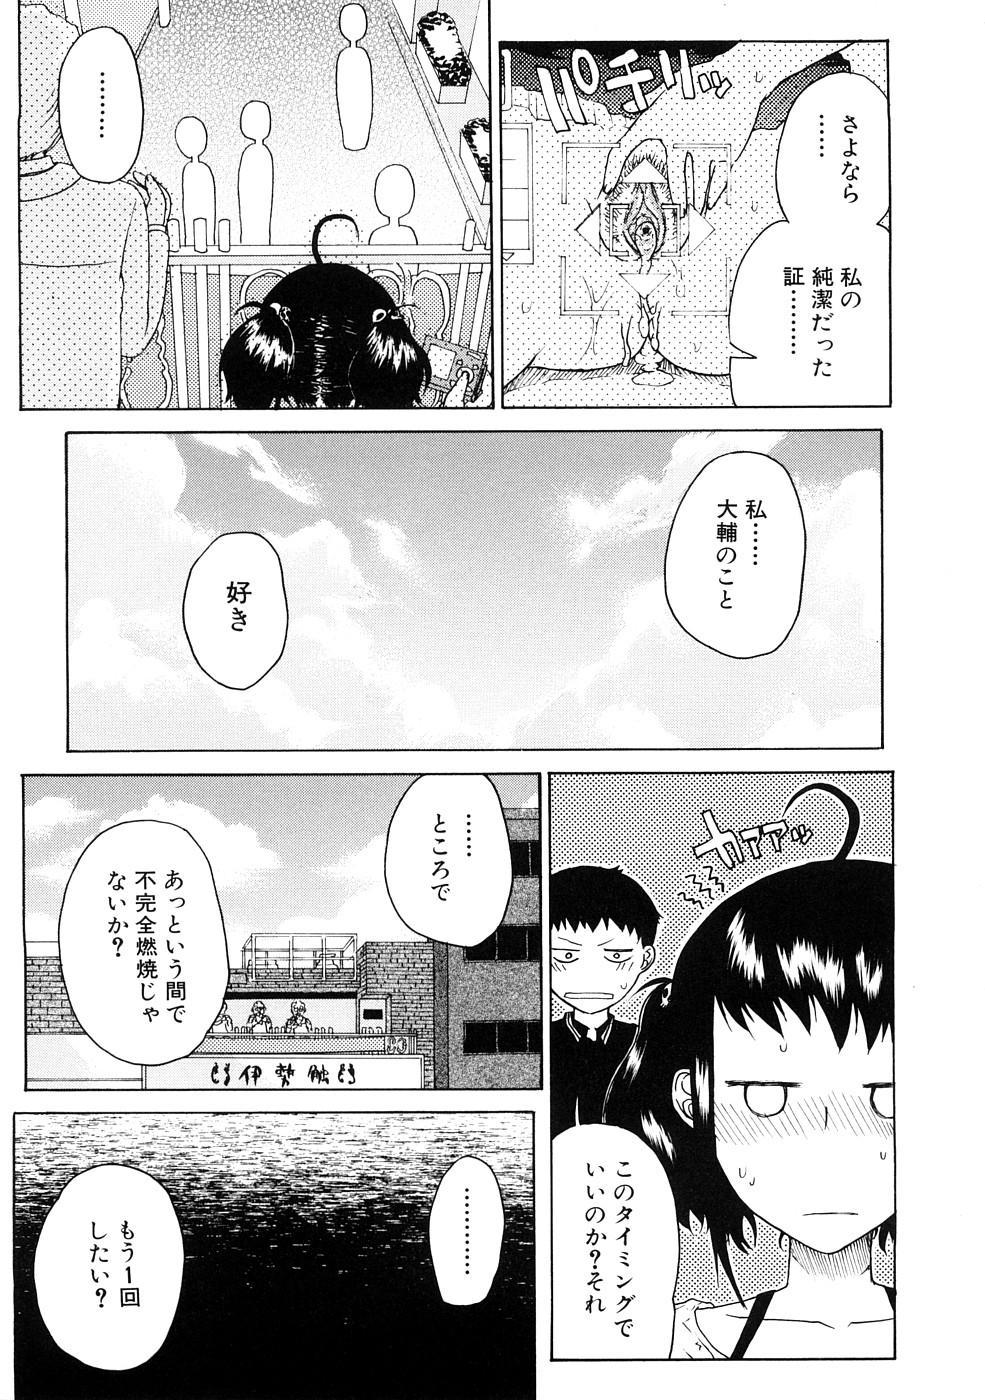 Ecchi de Jibunkatte de Kawaii Ko 28